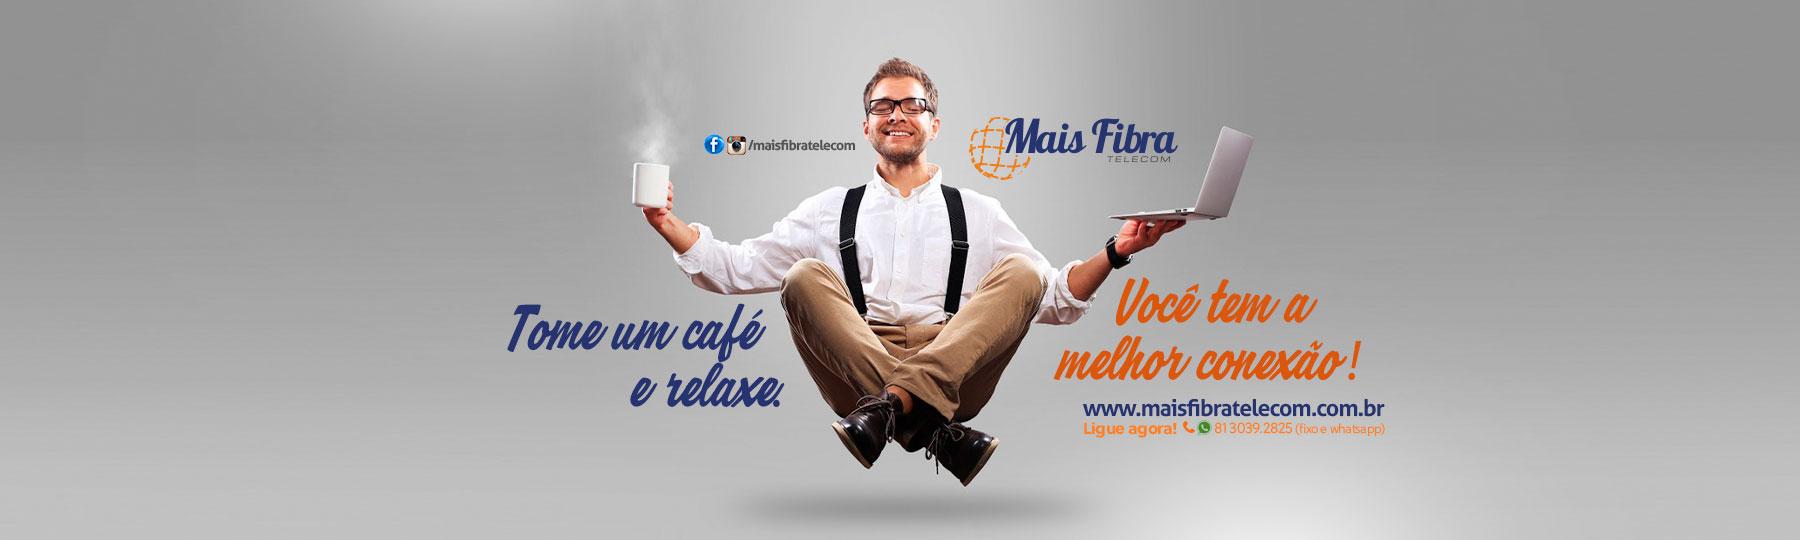 MAIS_FIBRA_BANNER_GIRATORIO_SITE_01